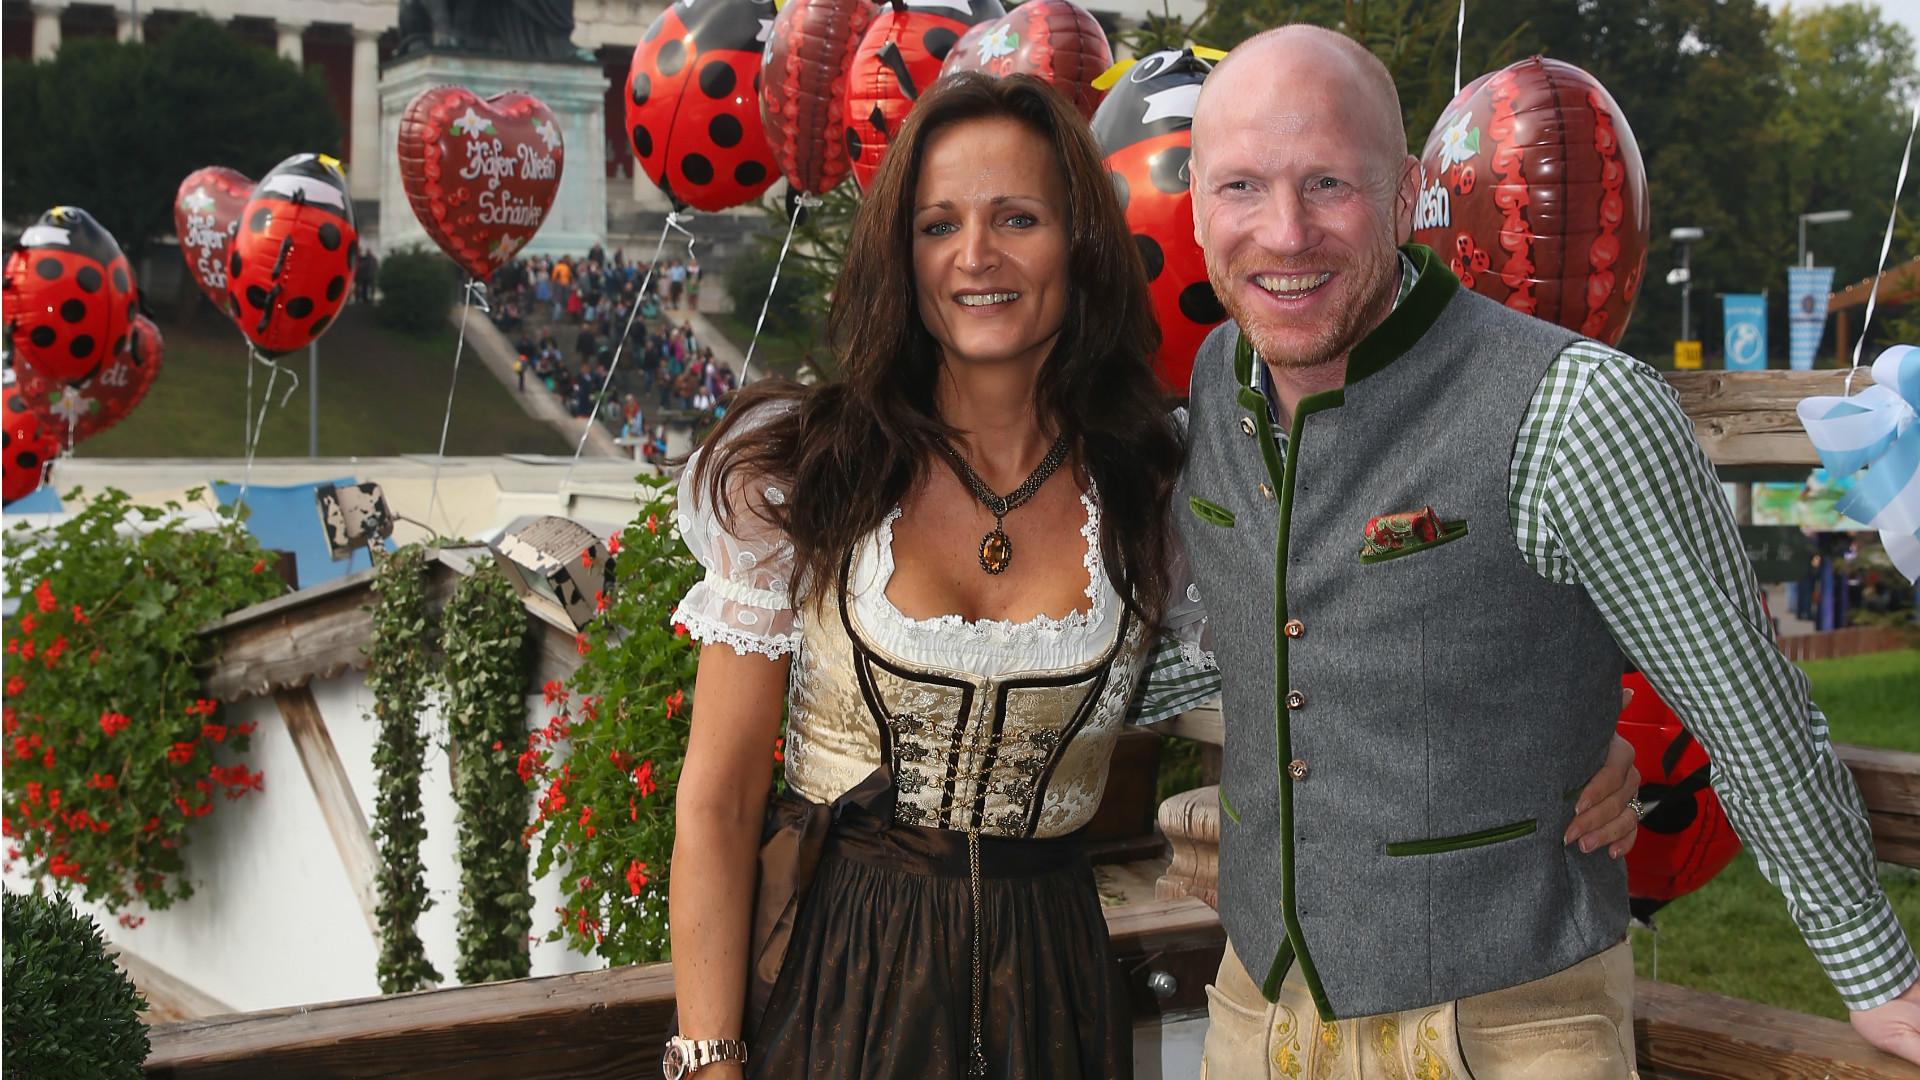 Matthias Sammer FC Bayern Munchen Oktoberfest - Goal.com